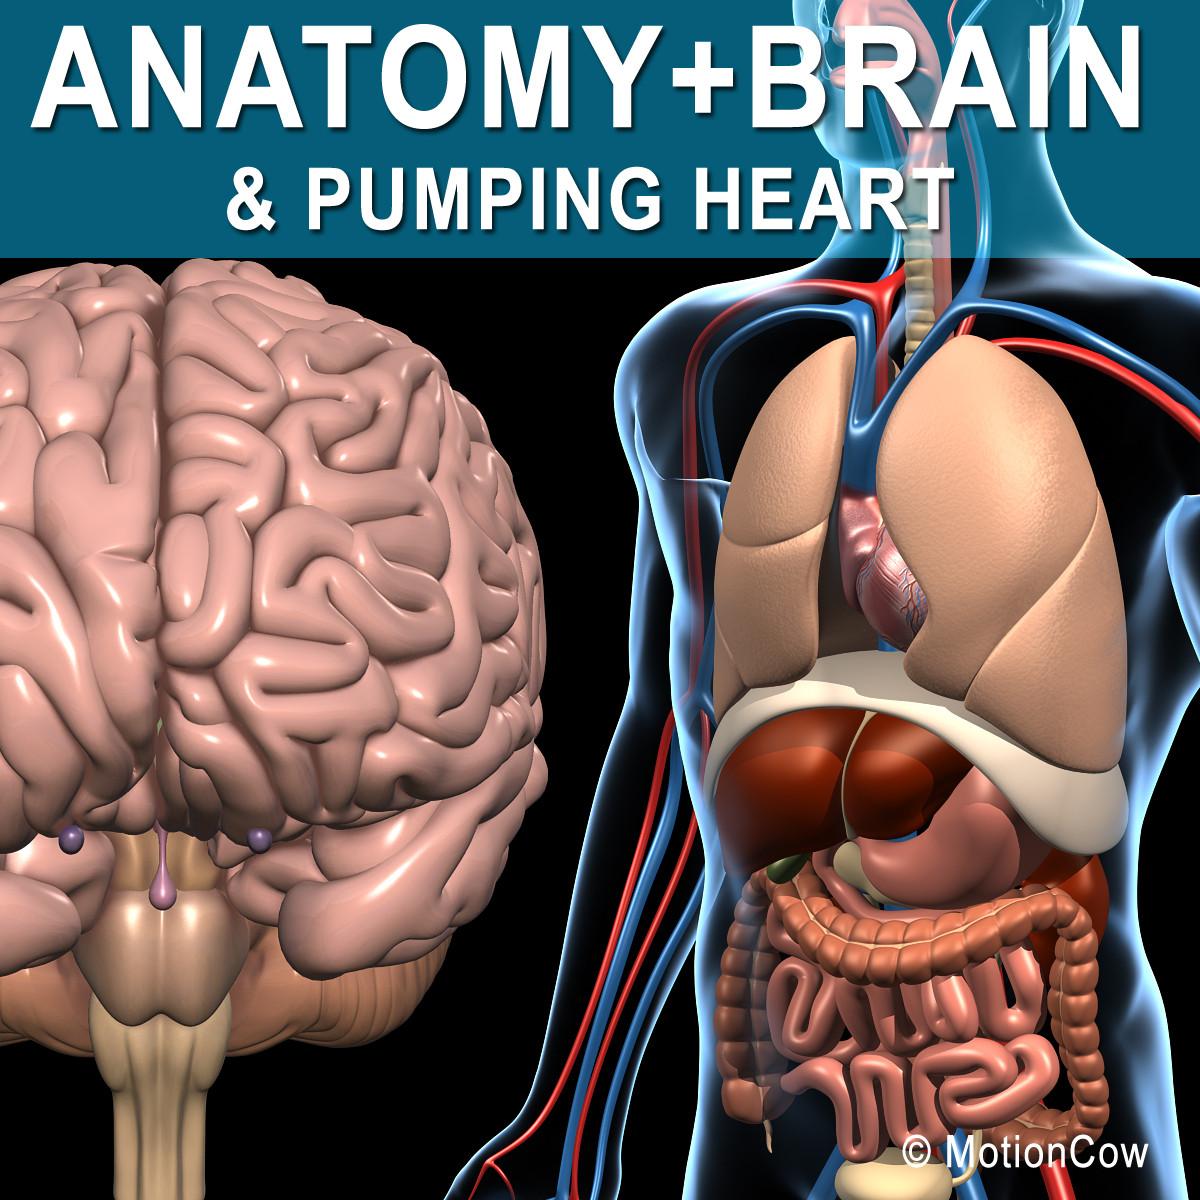 Anatomy_Brain_A.jpg